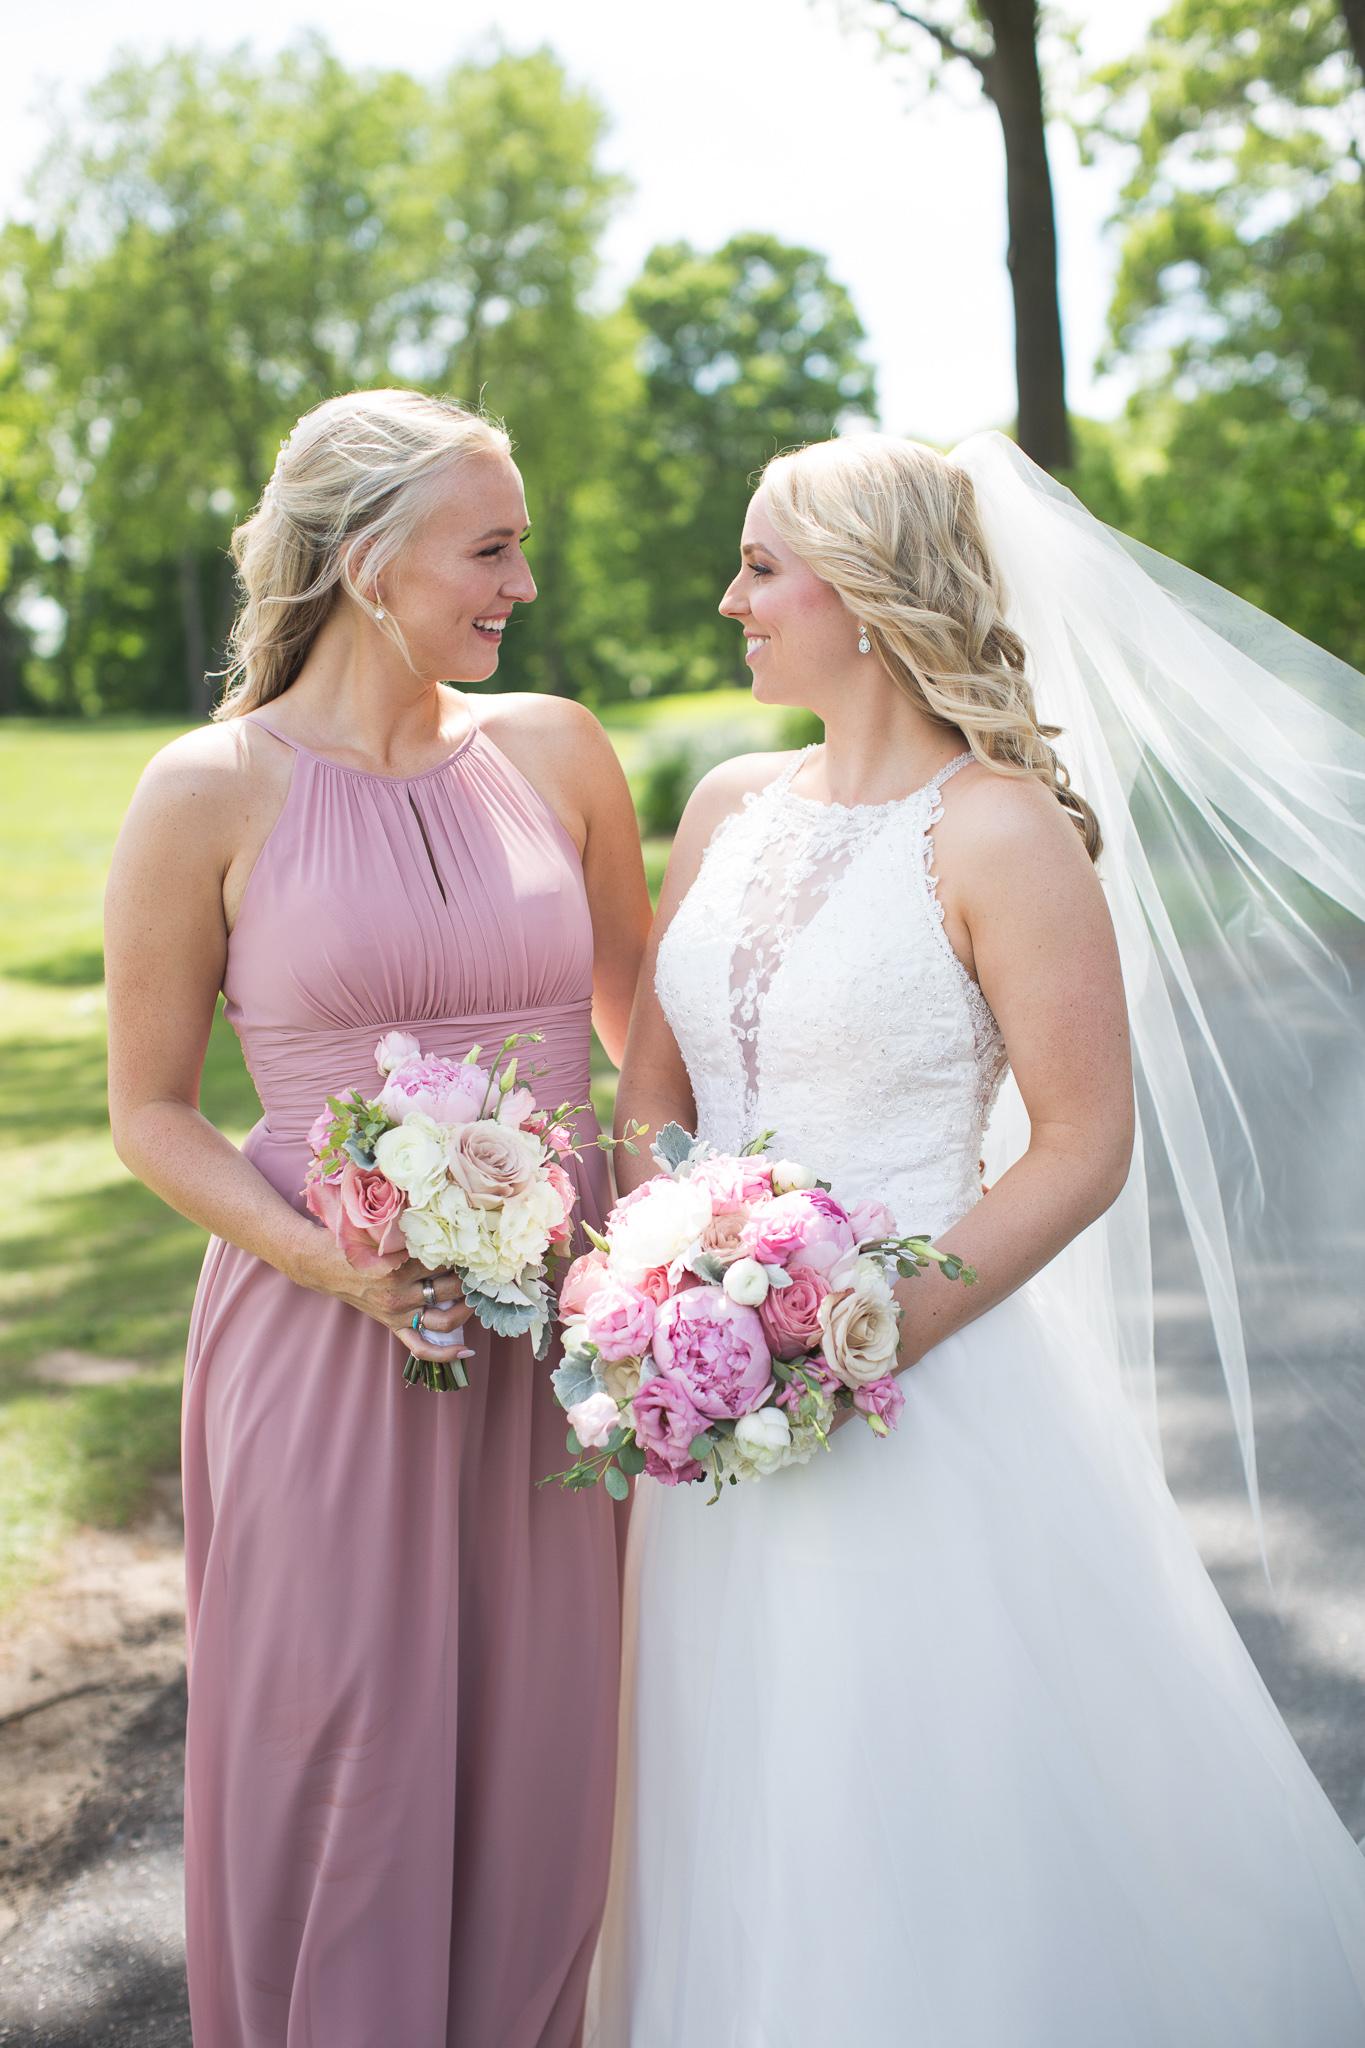 030-best-detroit-michigan-outdoor-wedding-photographer.jpg